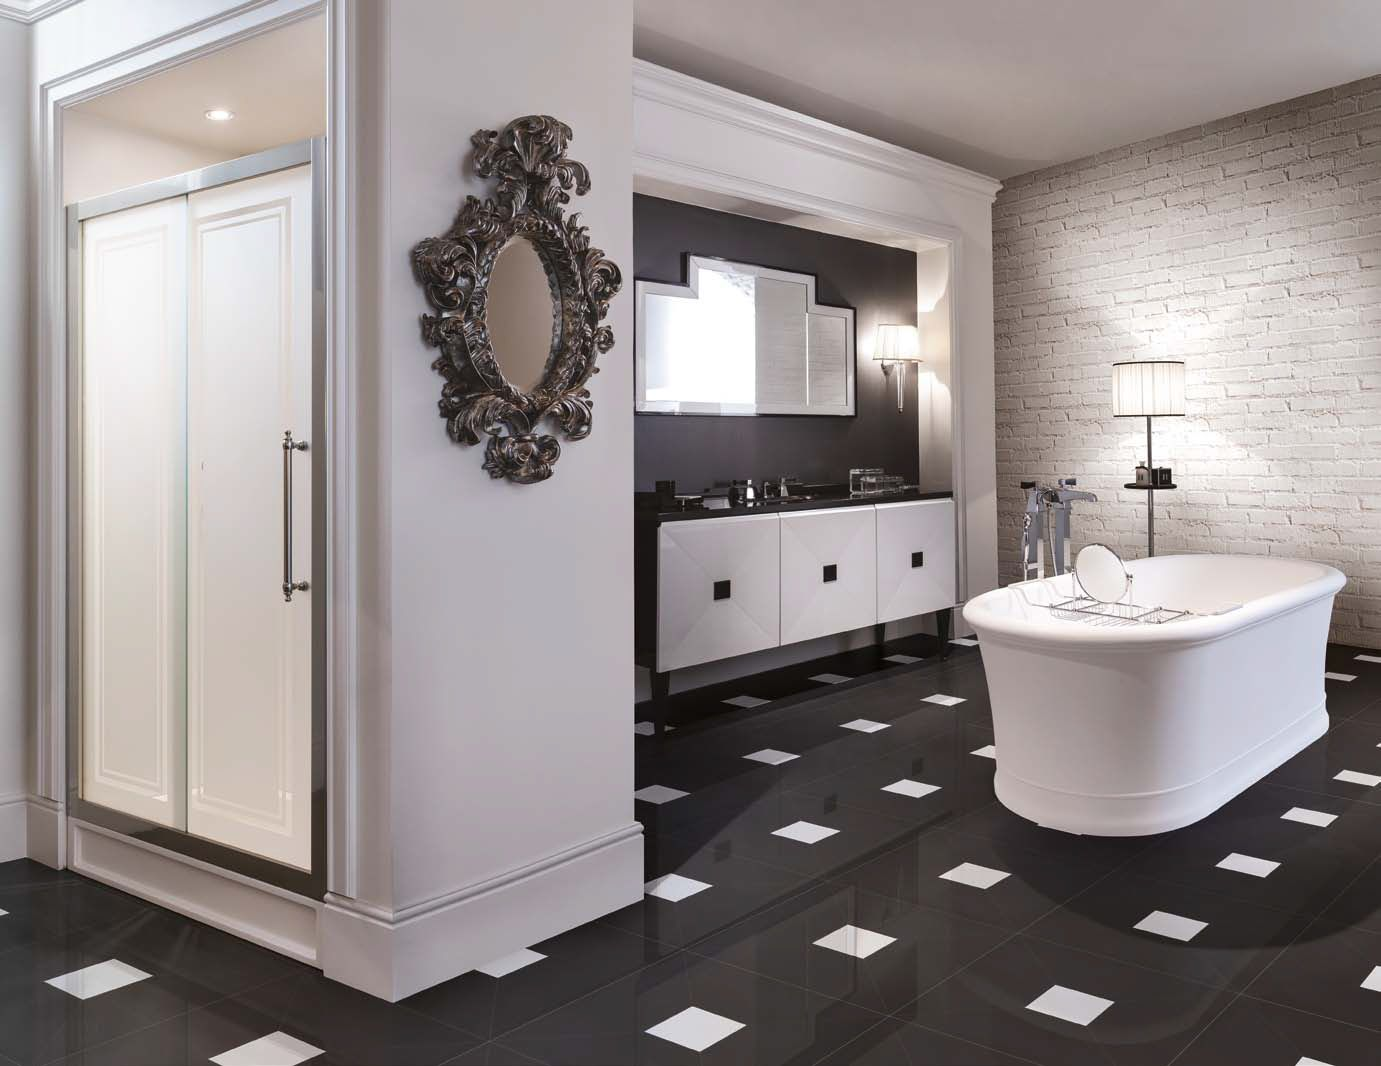 Inspired bathroom blog by diamond interiors vanity basin vanity bench - Majestic Shower Door Jetset Vanity Unit Celine Bathtub Atelier Diamond Flooring